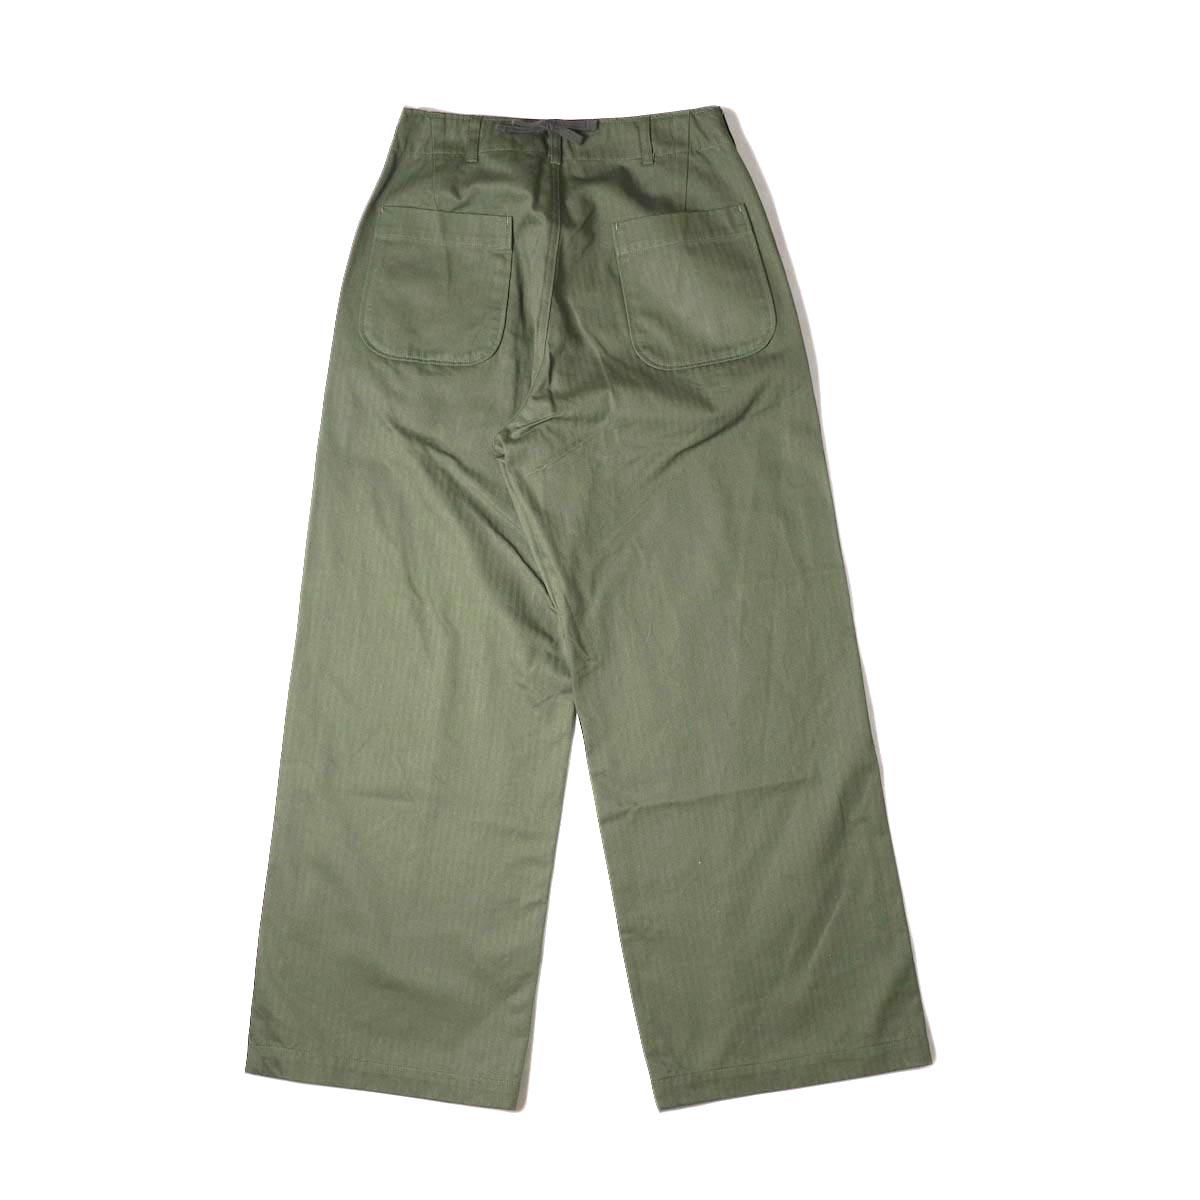 ENGINEERED GARMENTS / Sailor Pant (olive) 背面